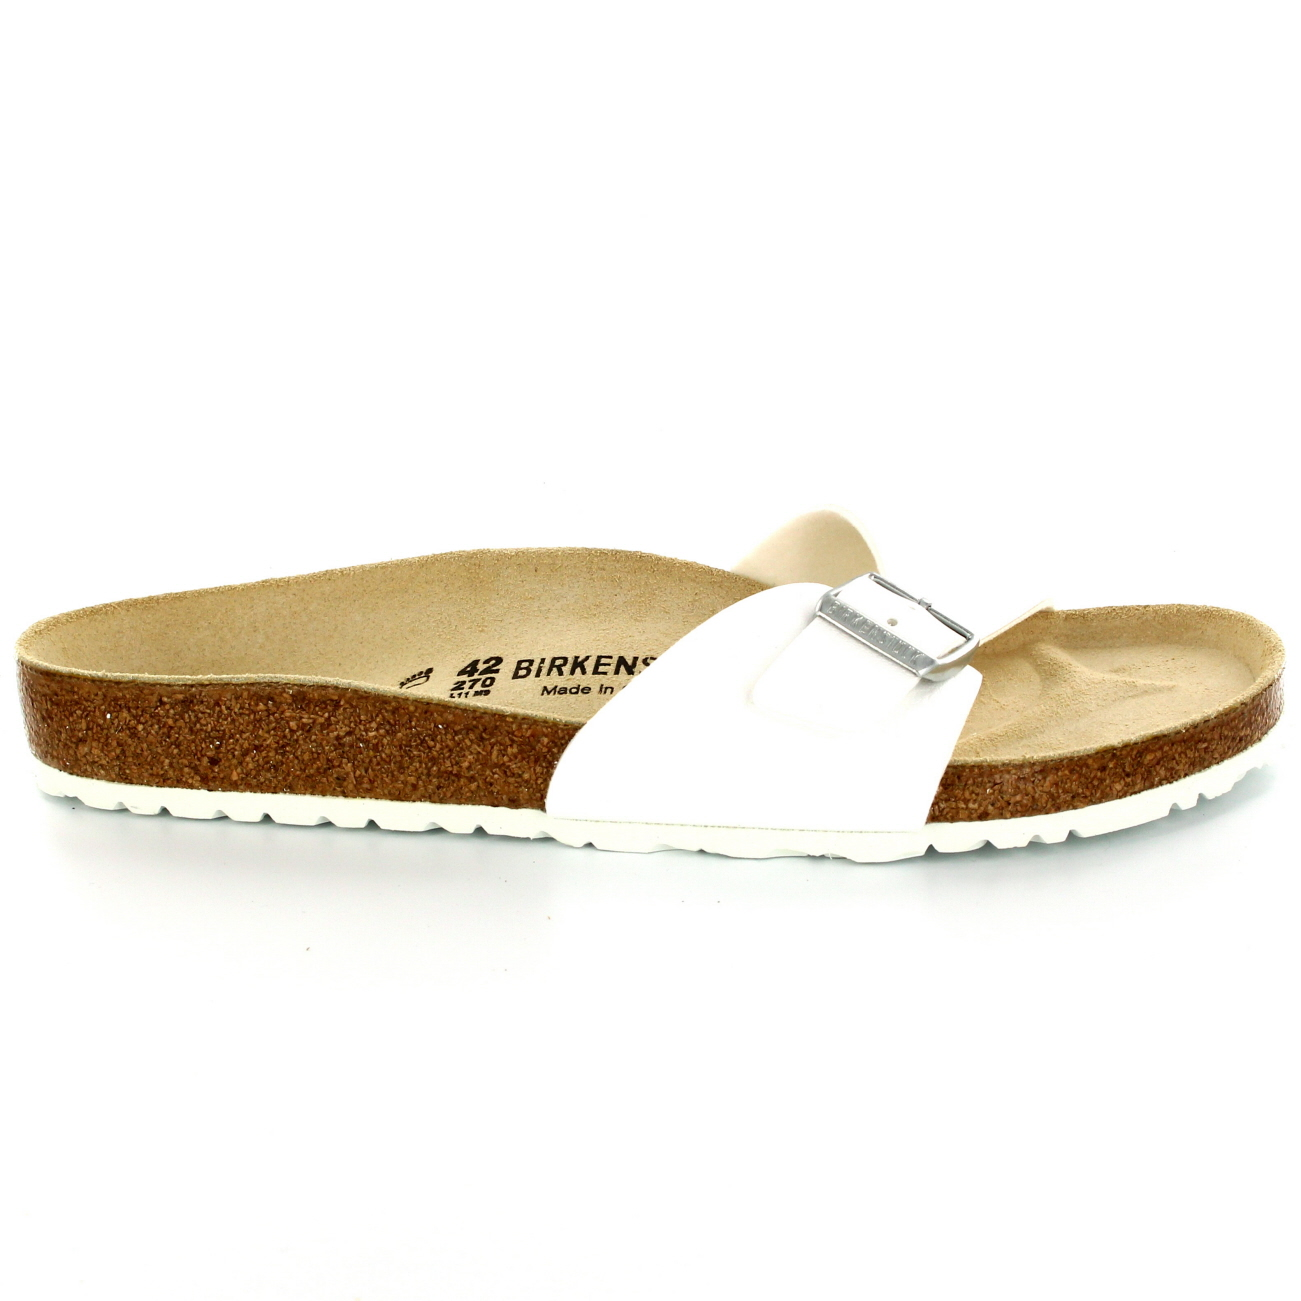 Unisex-Adults-Birkenstock-Madrid-Casual-Birko-Flor-Beach-Summer-Sandals-UK-2-13 thumbnail 17